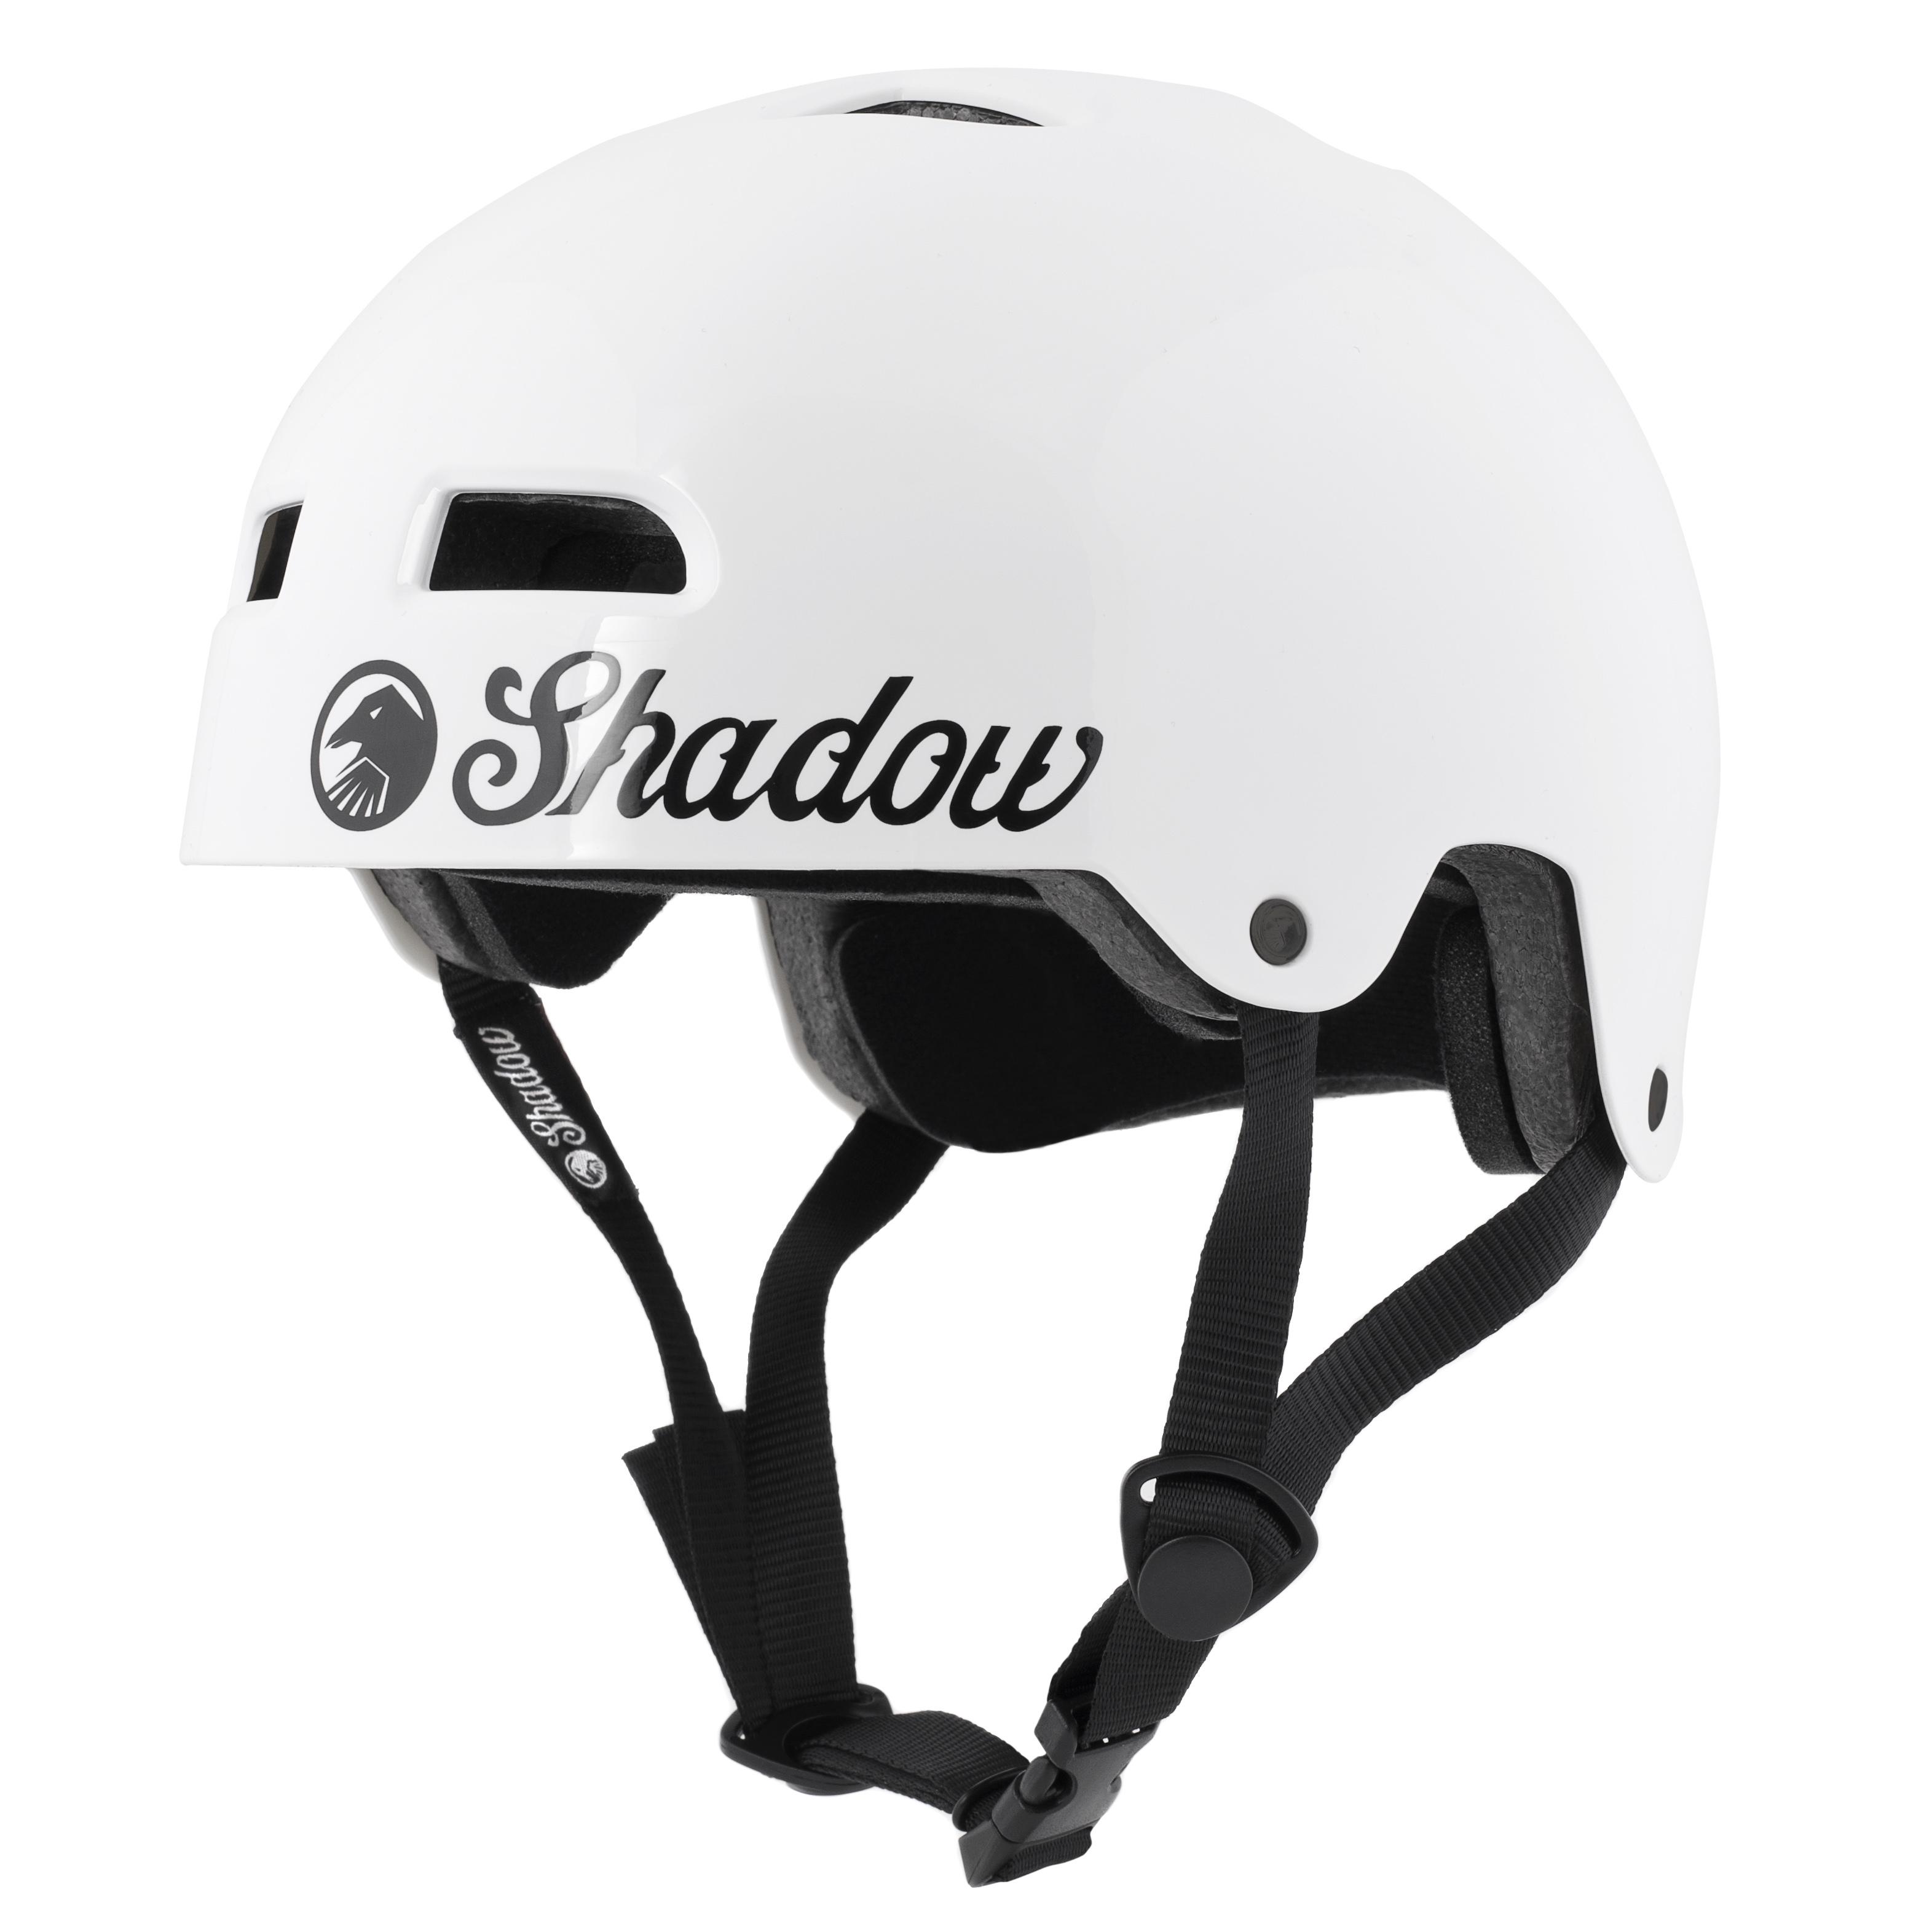 Shadow Classic Helmet (White)